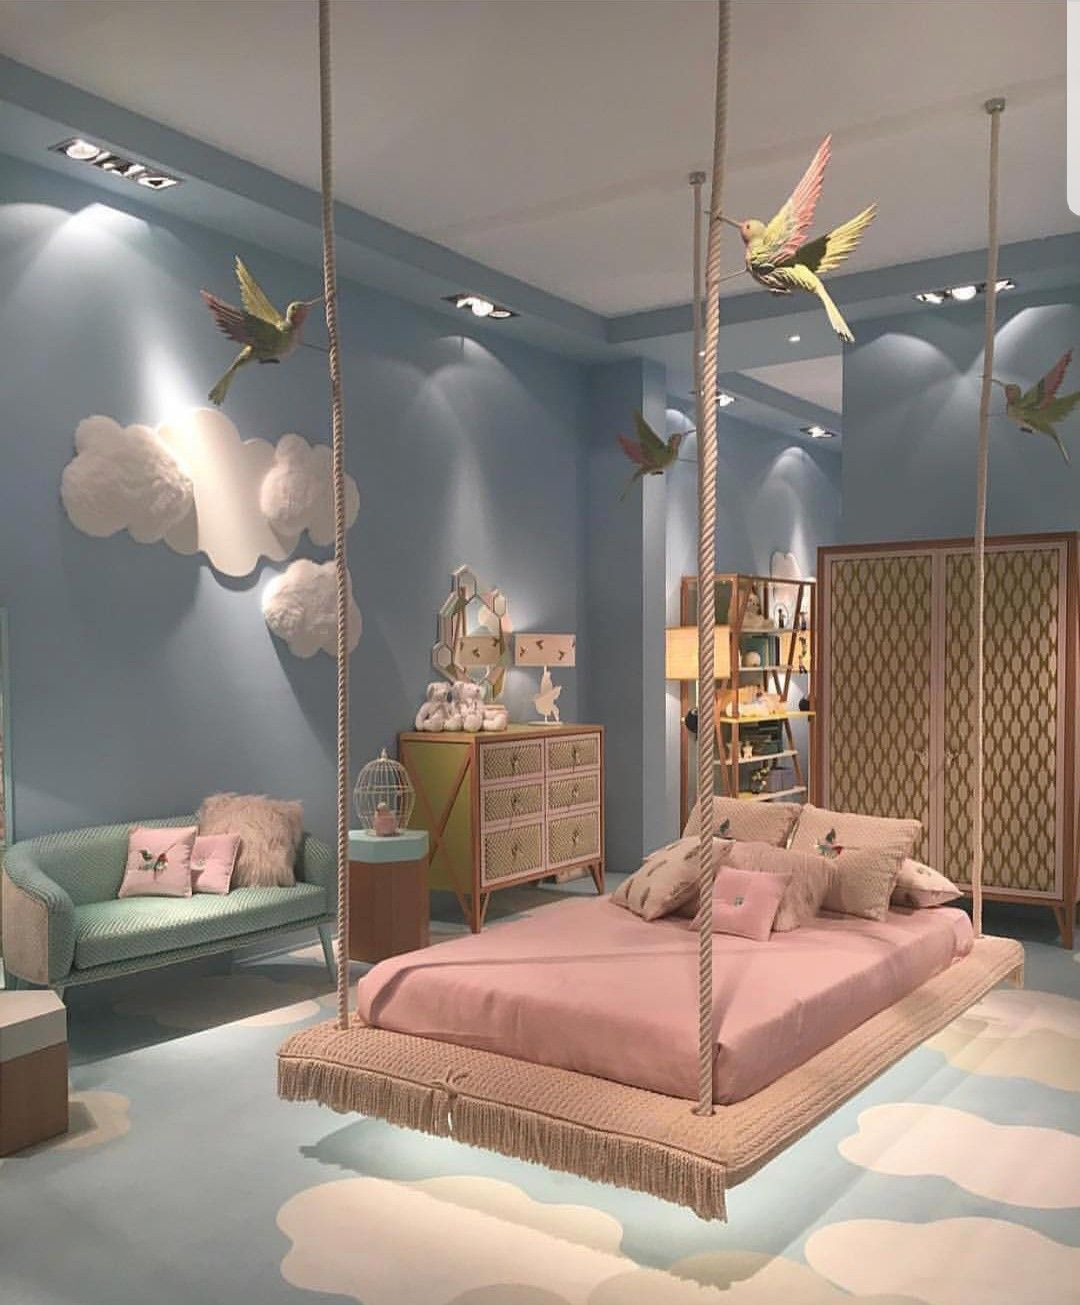 Pin By Kamelia Maloos On Kids Bedroom Girl Bedroom Designs Bedroom Design Girl Bedroom Decor